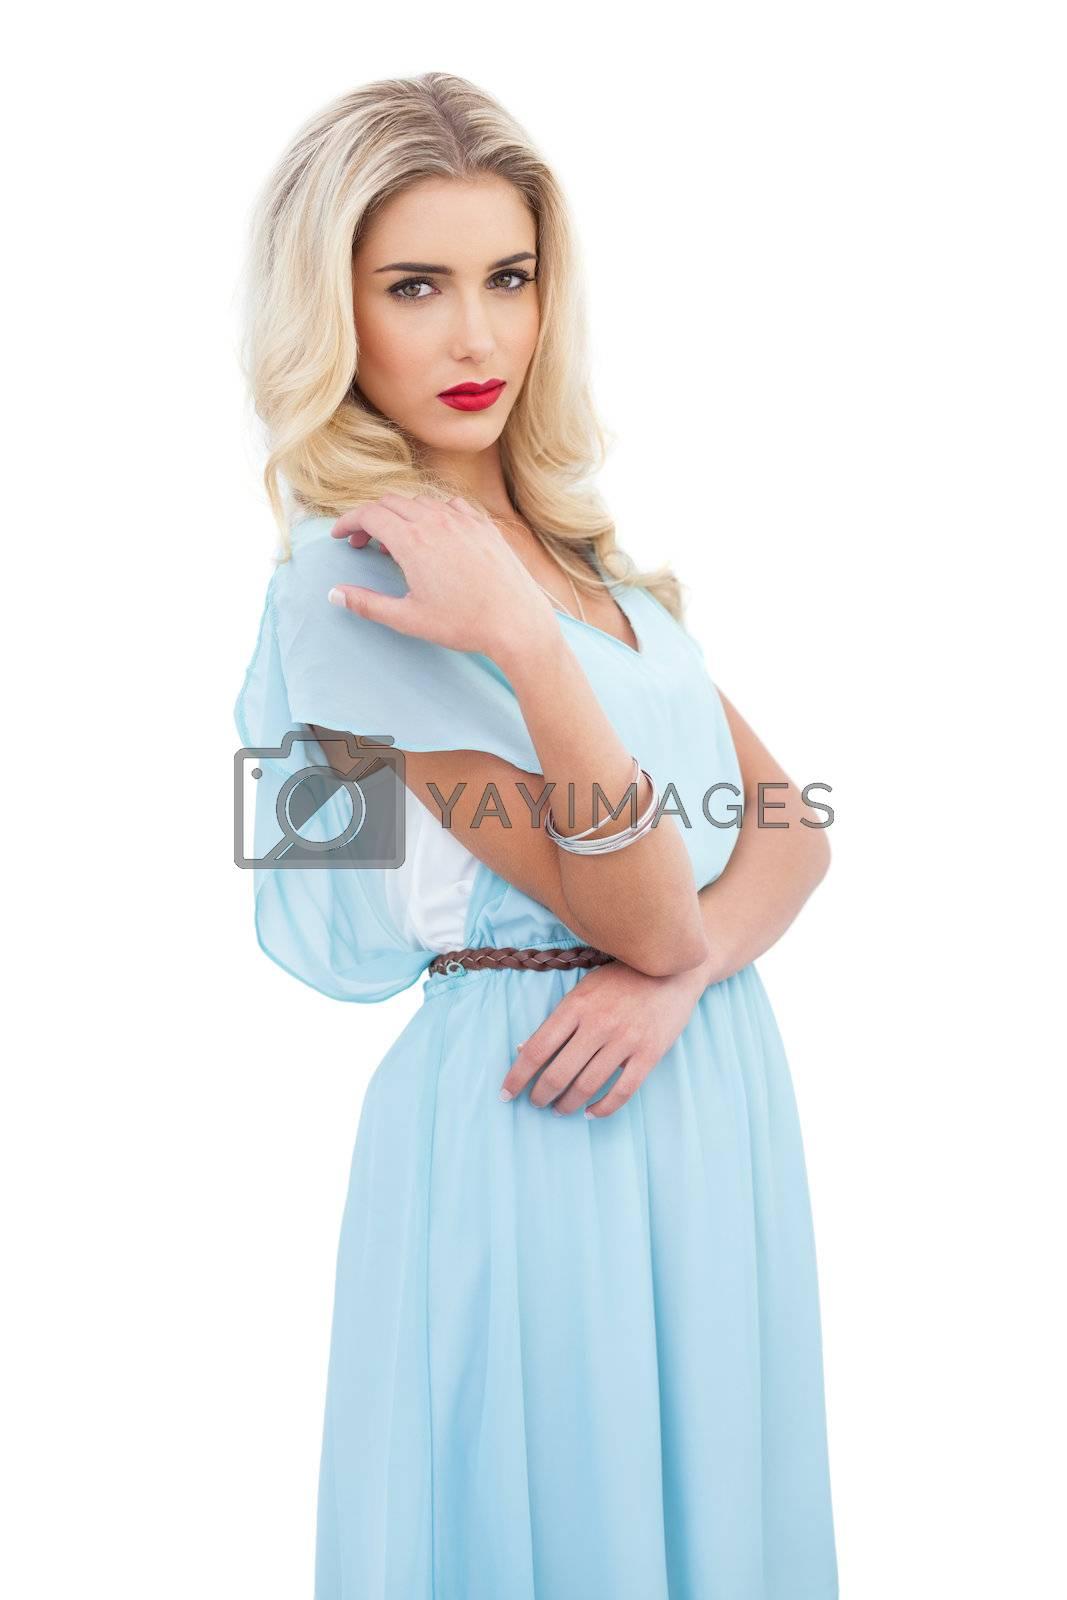 Serious blonde model in blue dress posing holding her shoulder by Wavebreakmedia